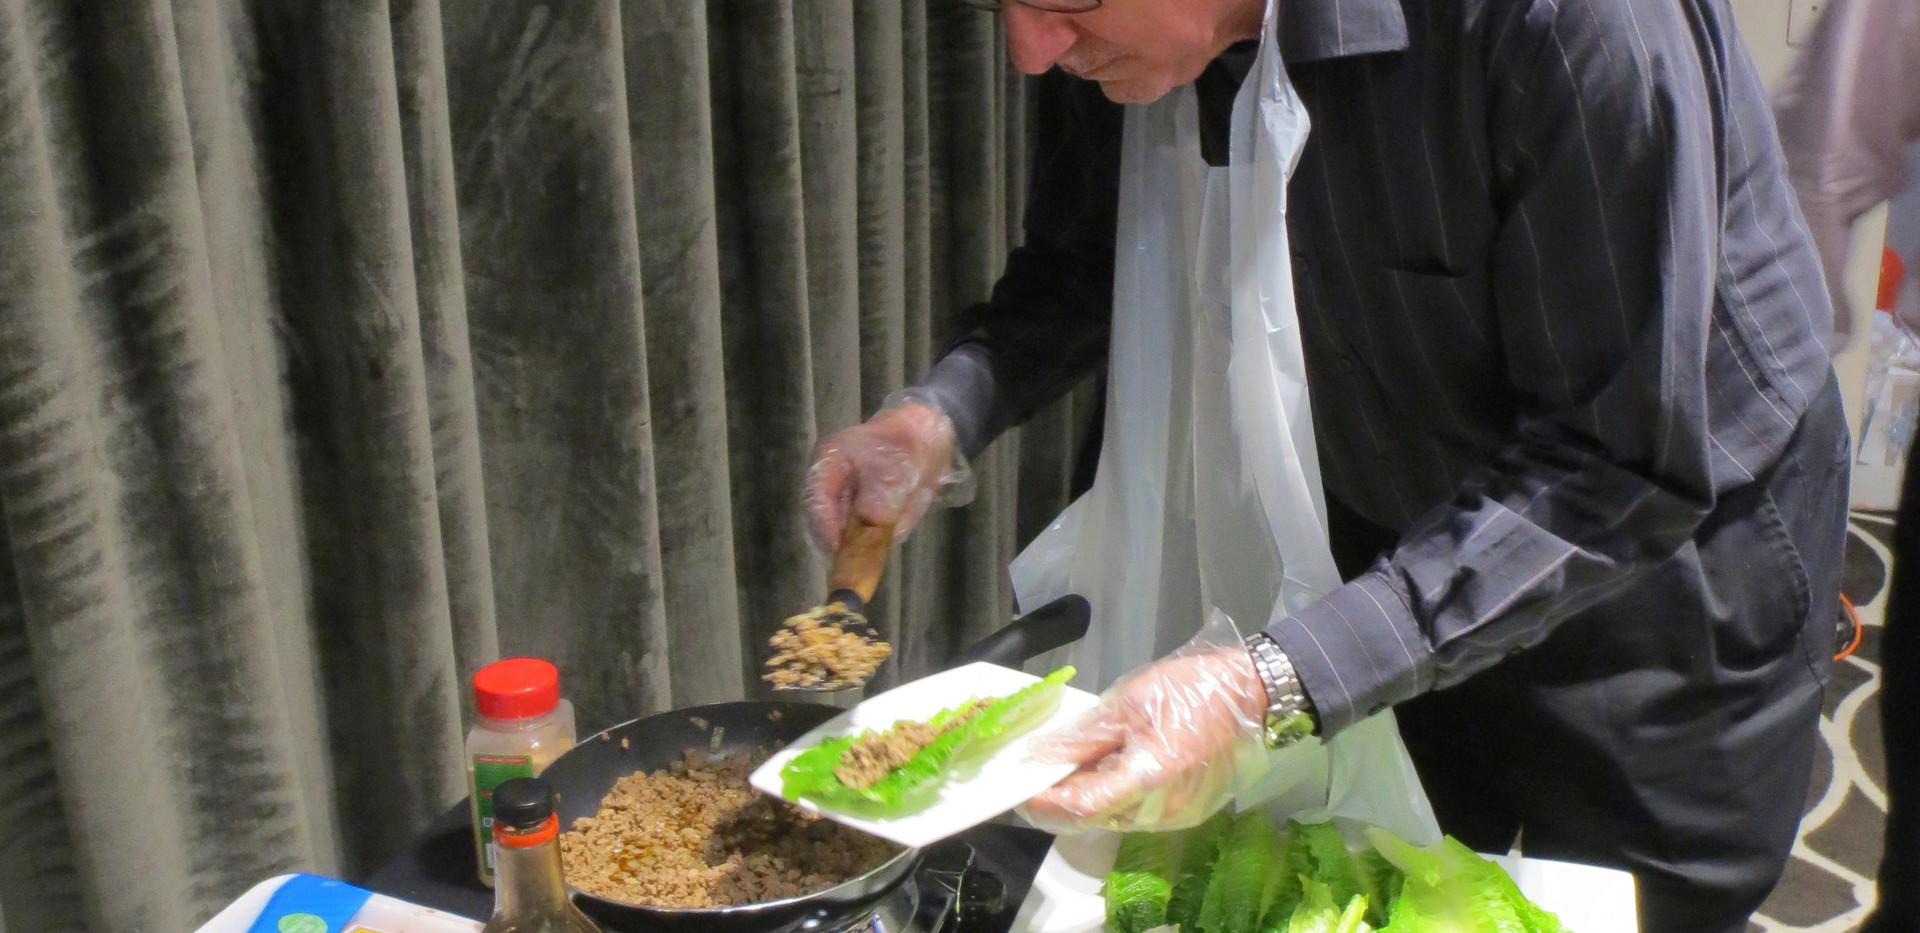 Hot plate cooking turkey lettuce wraps C